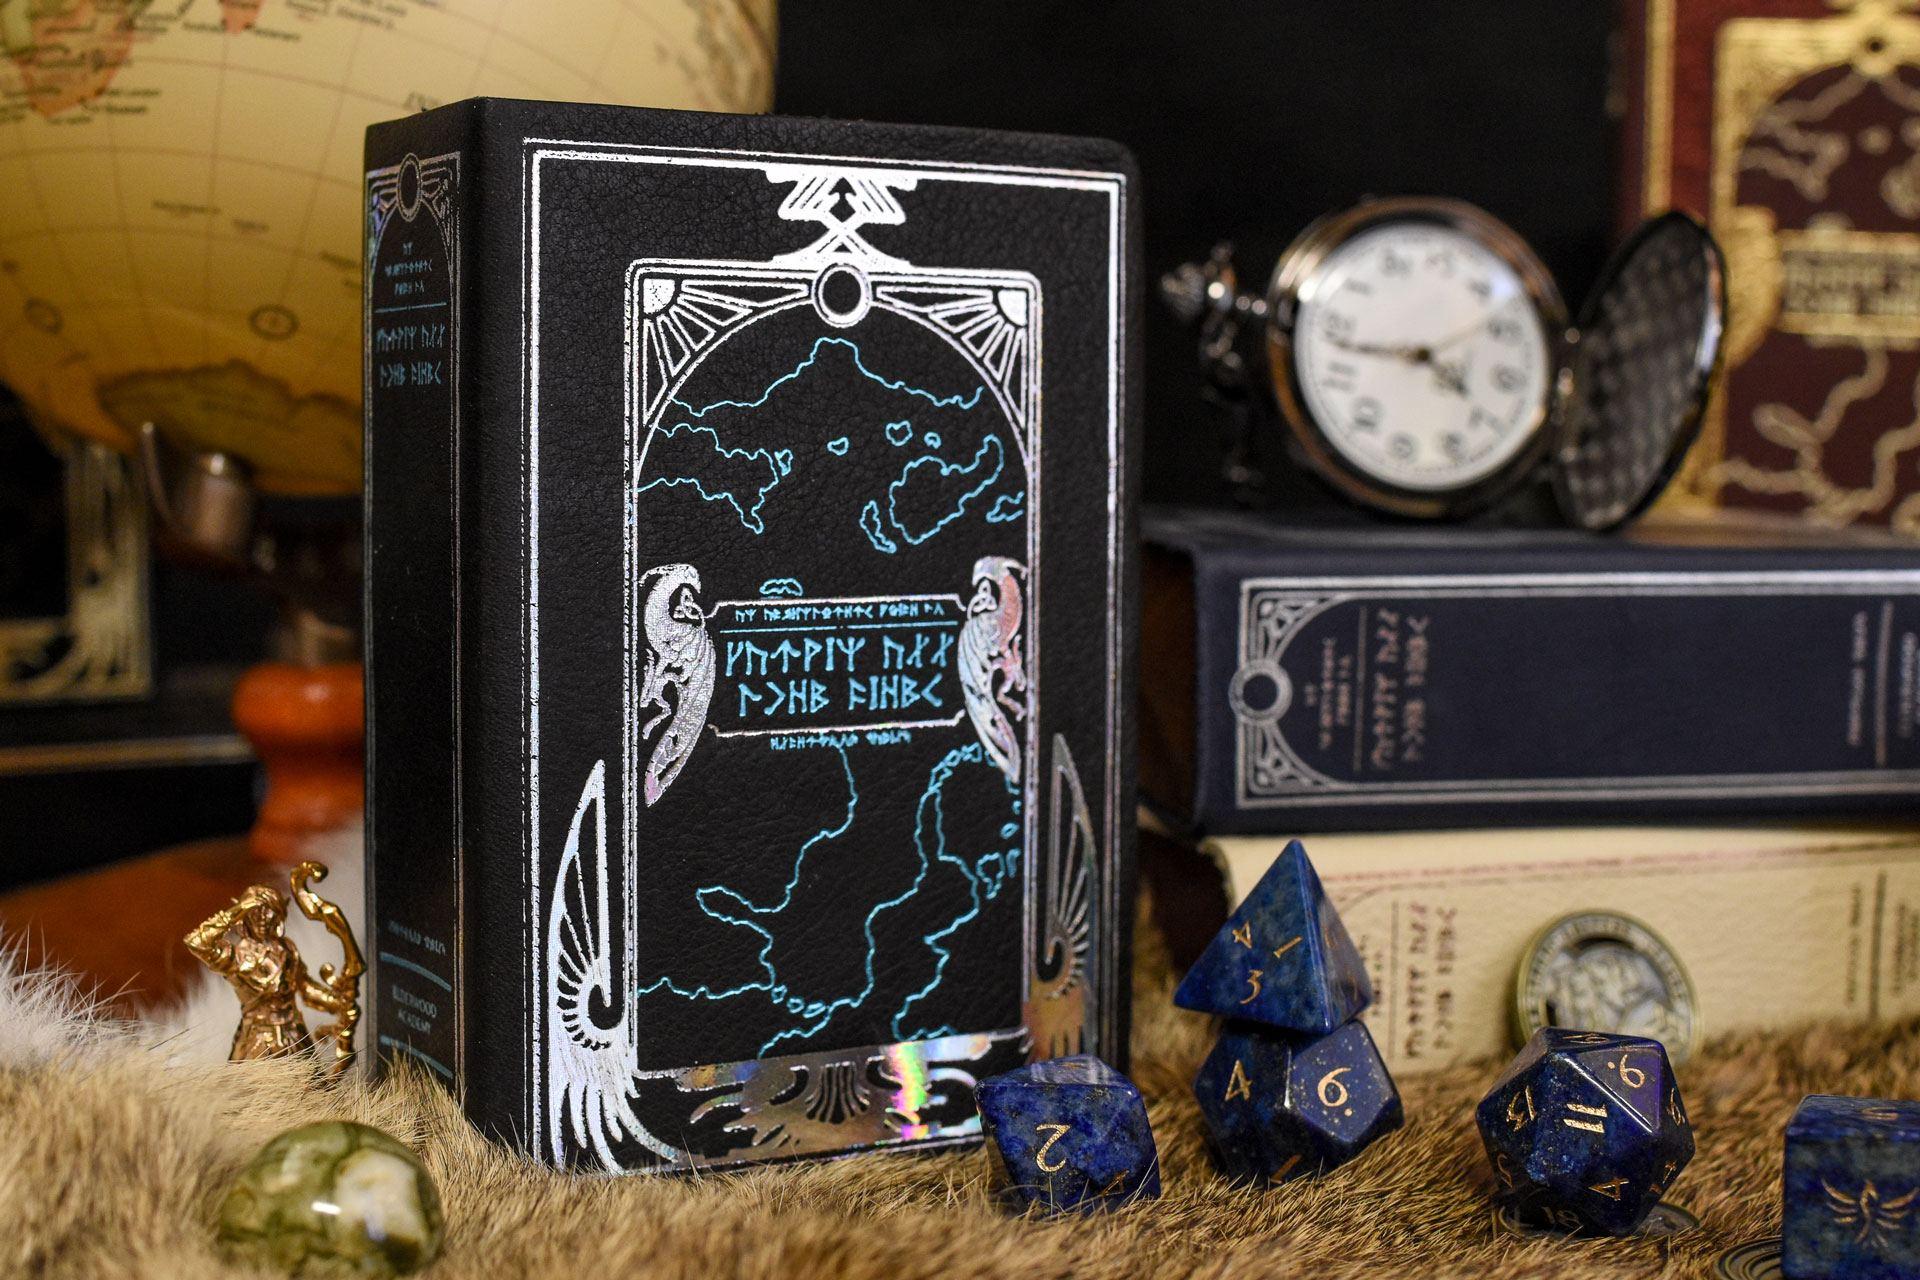 mini-spellbook-map-in-quest-environment